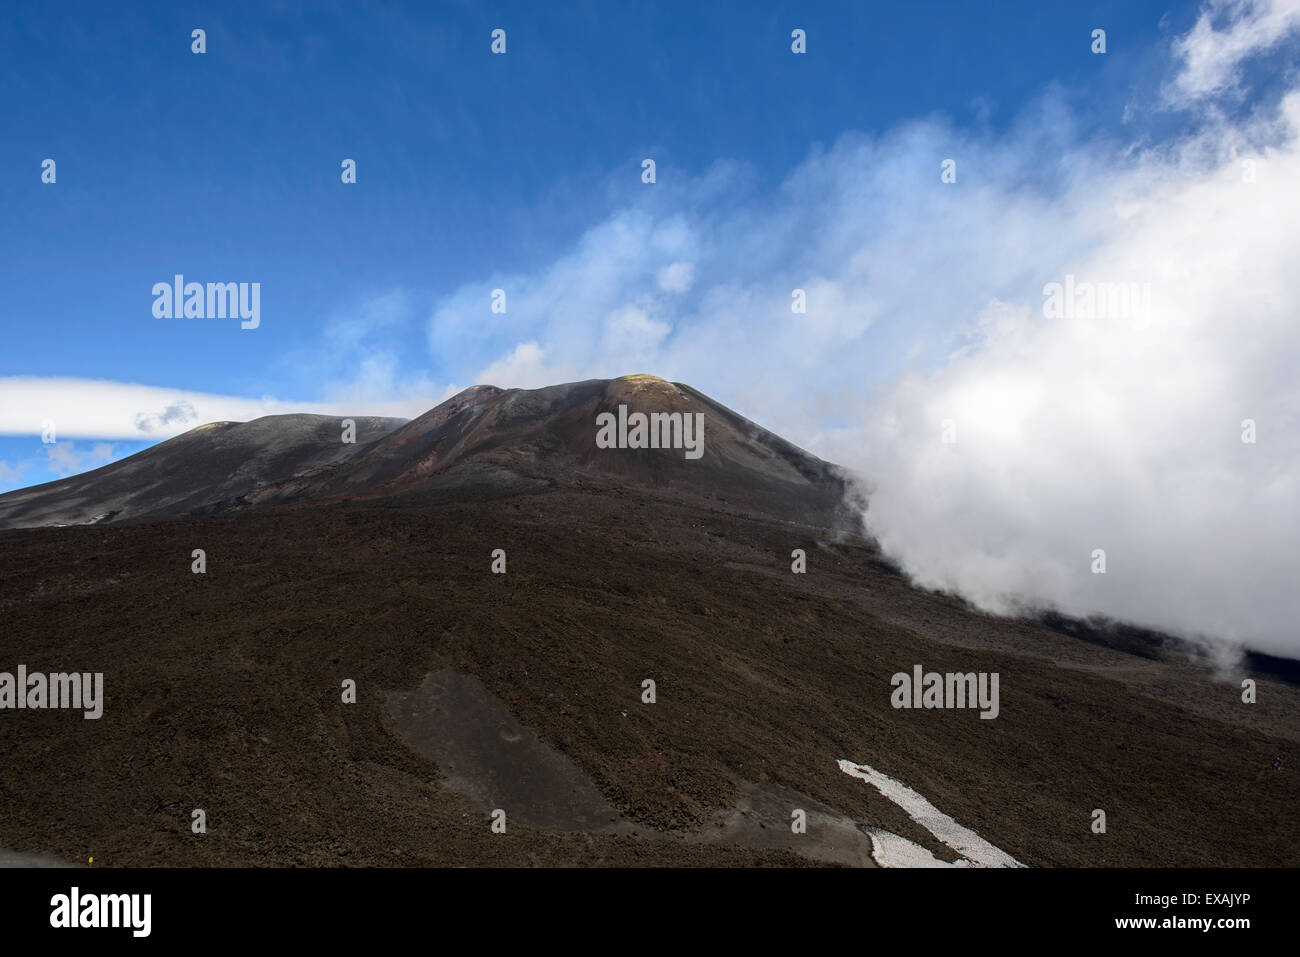 Mount Etna, Sicily - Stock Image